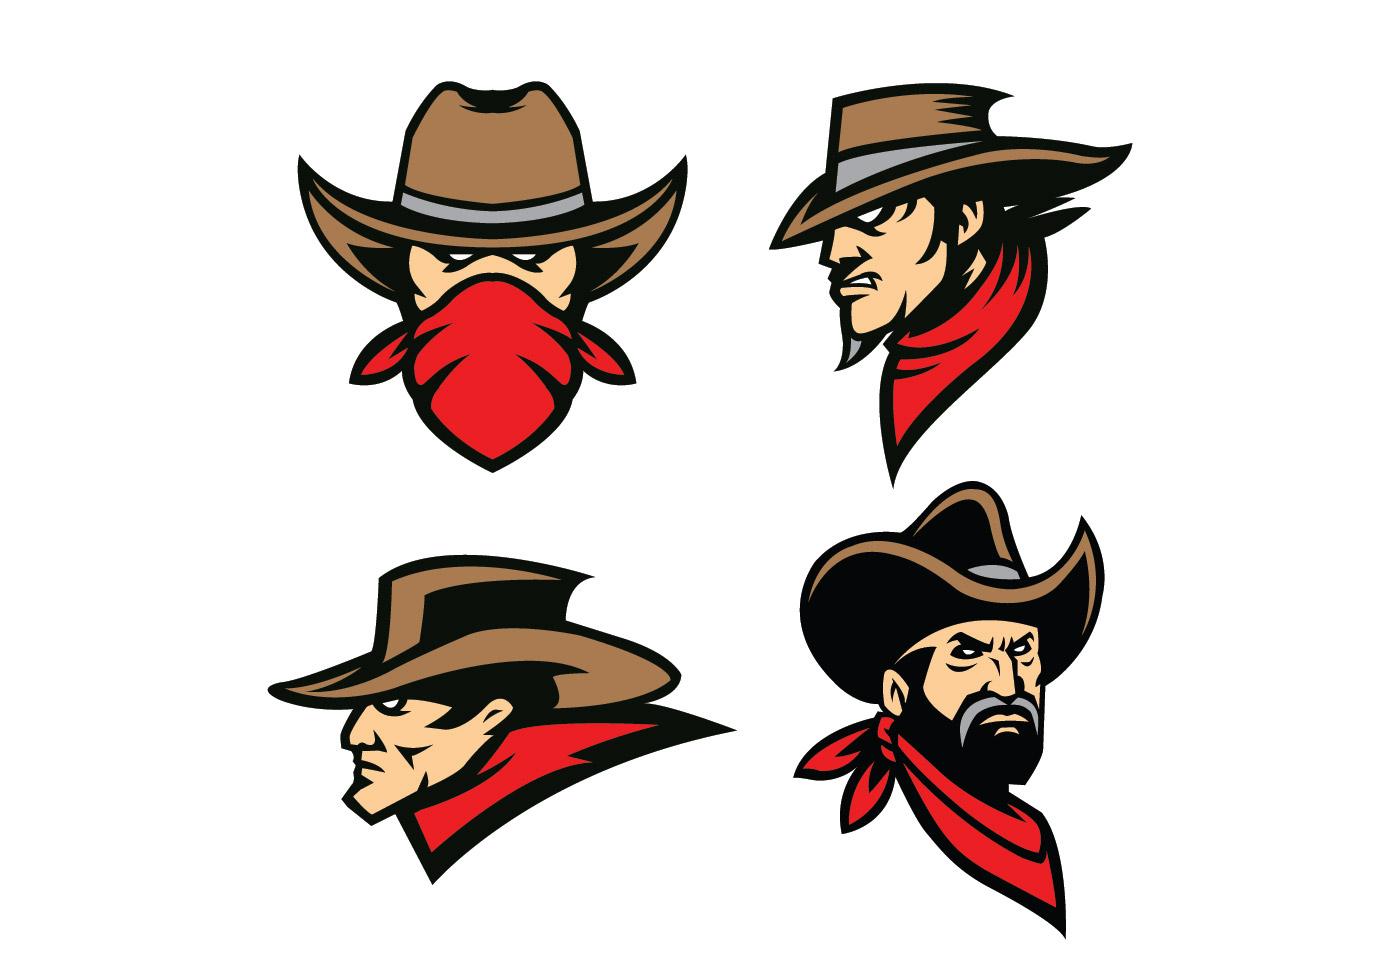 Free download of Wyoming Cowboy vector logos